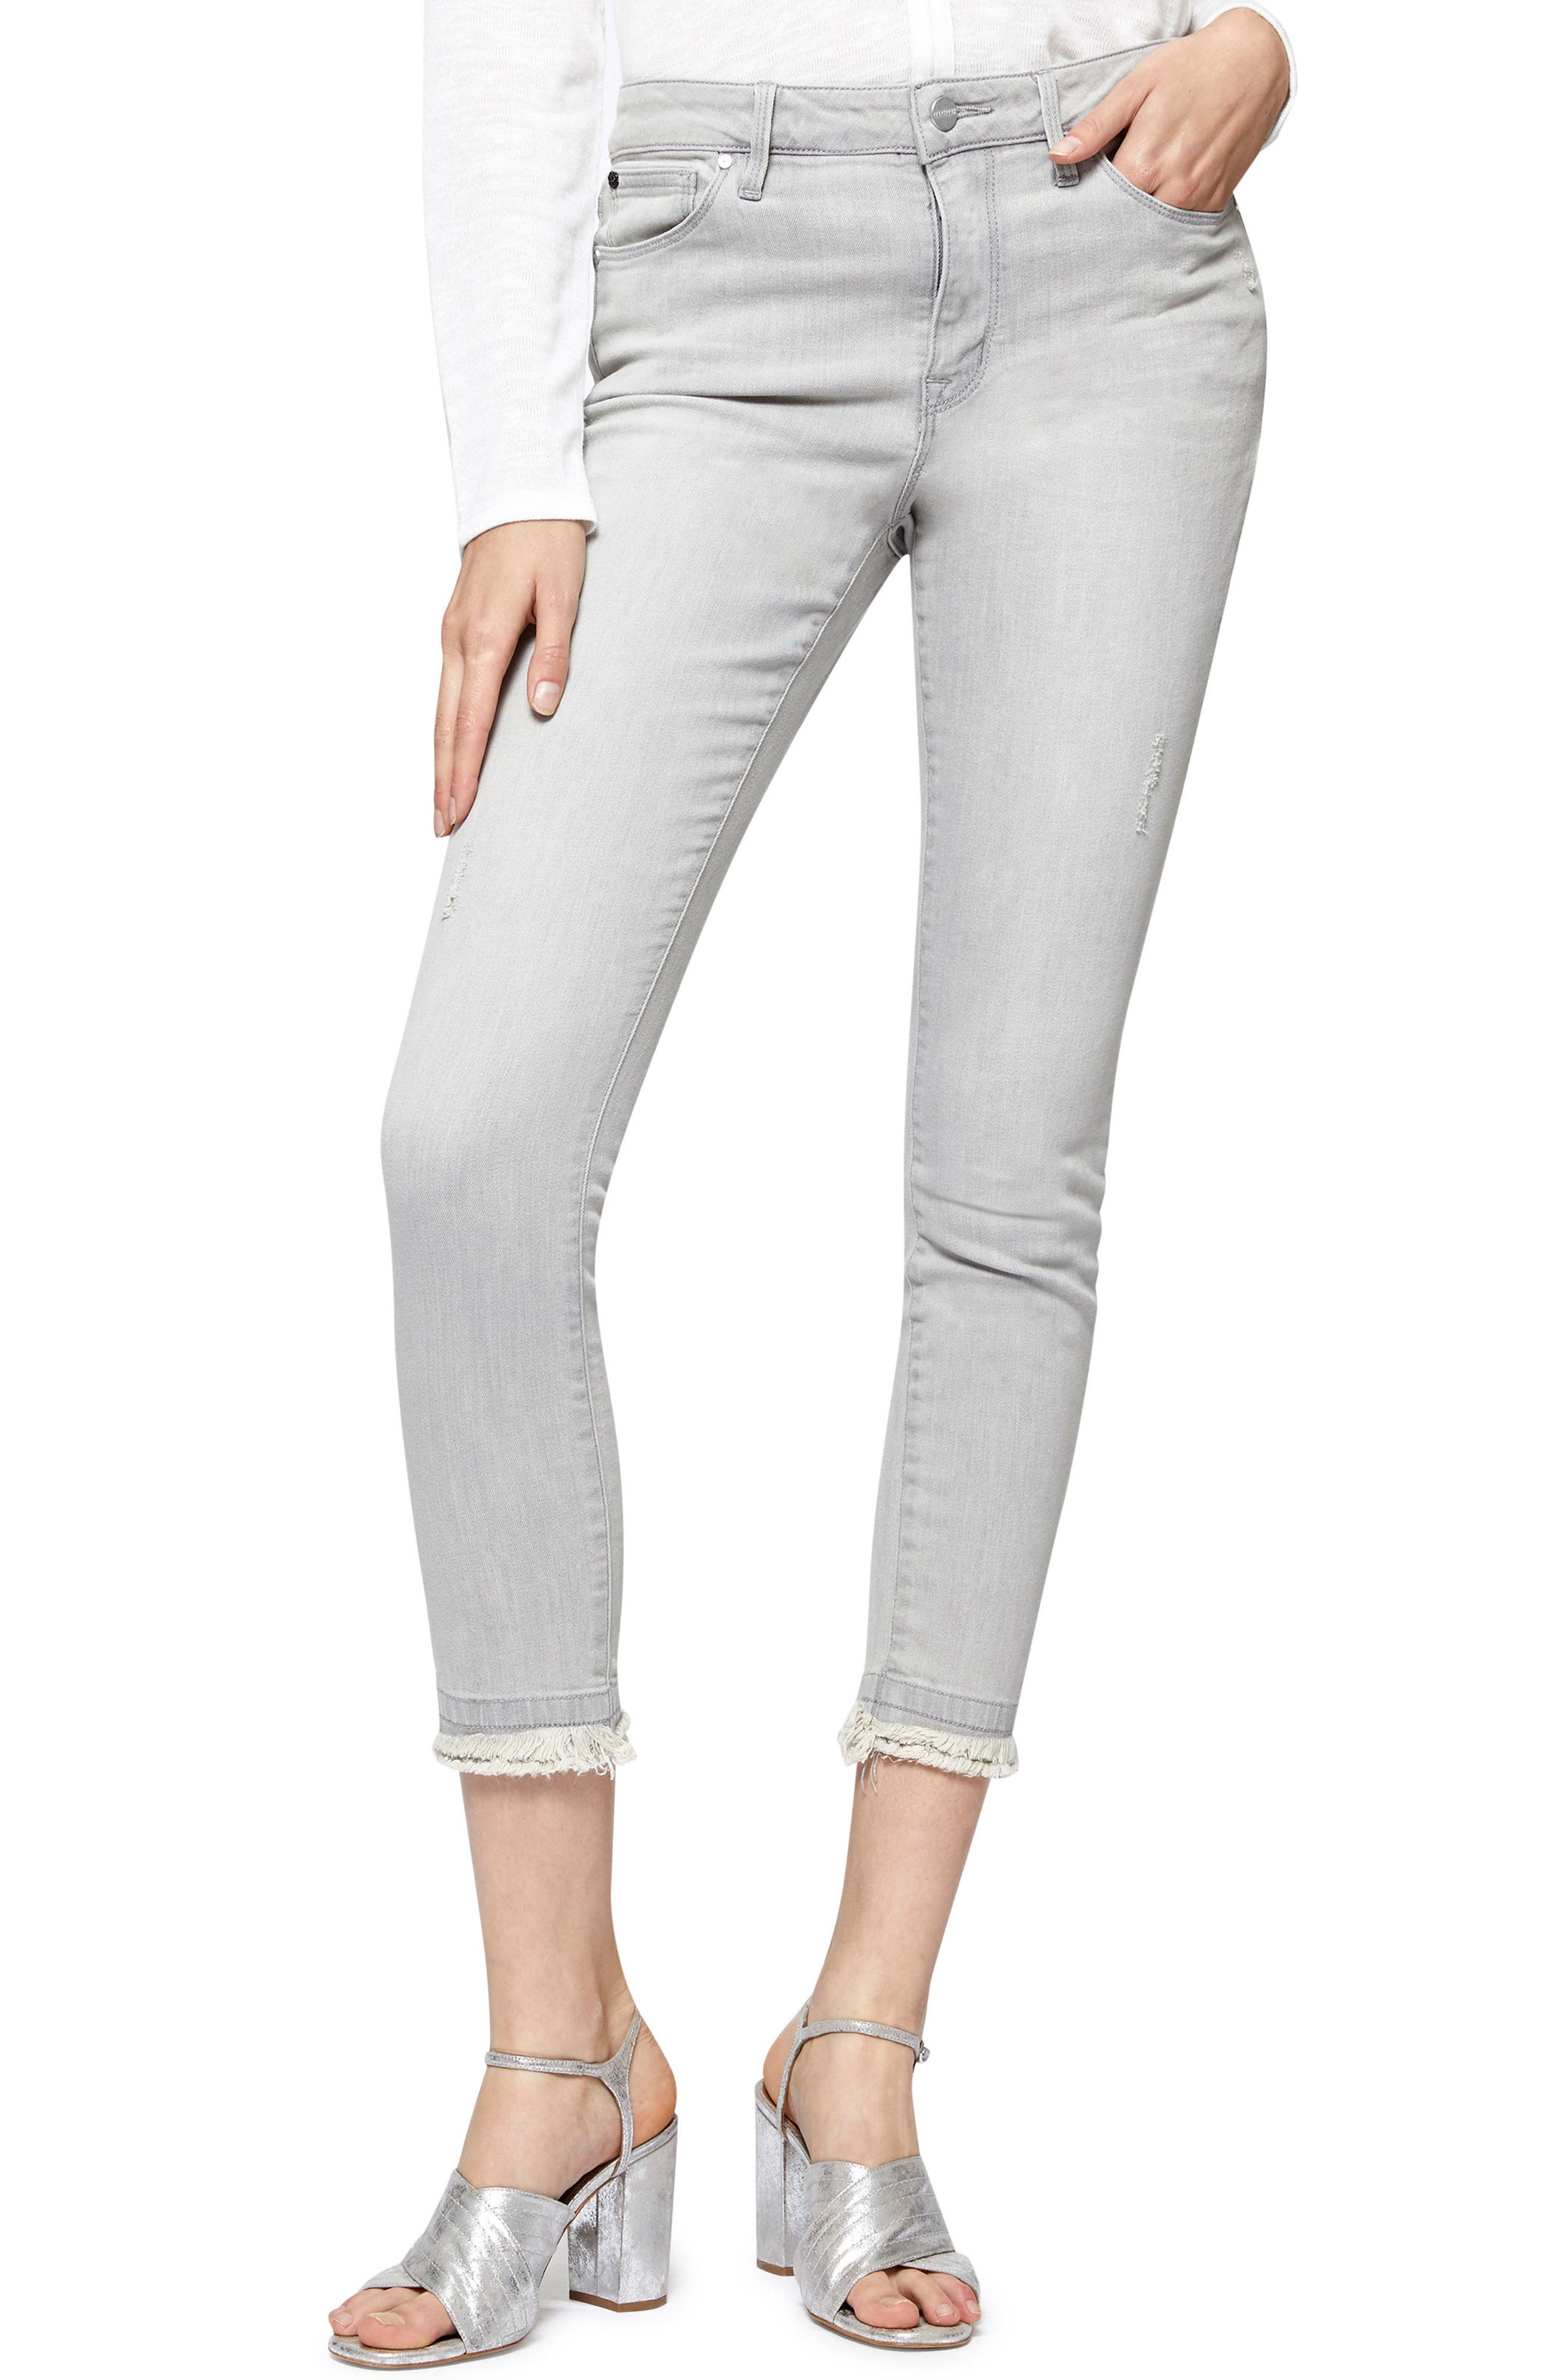 Saige Double Fray Ankle Jeans,                         Main,                         color, Greyson